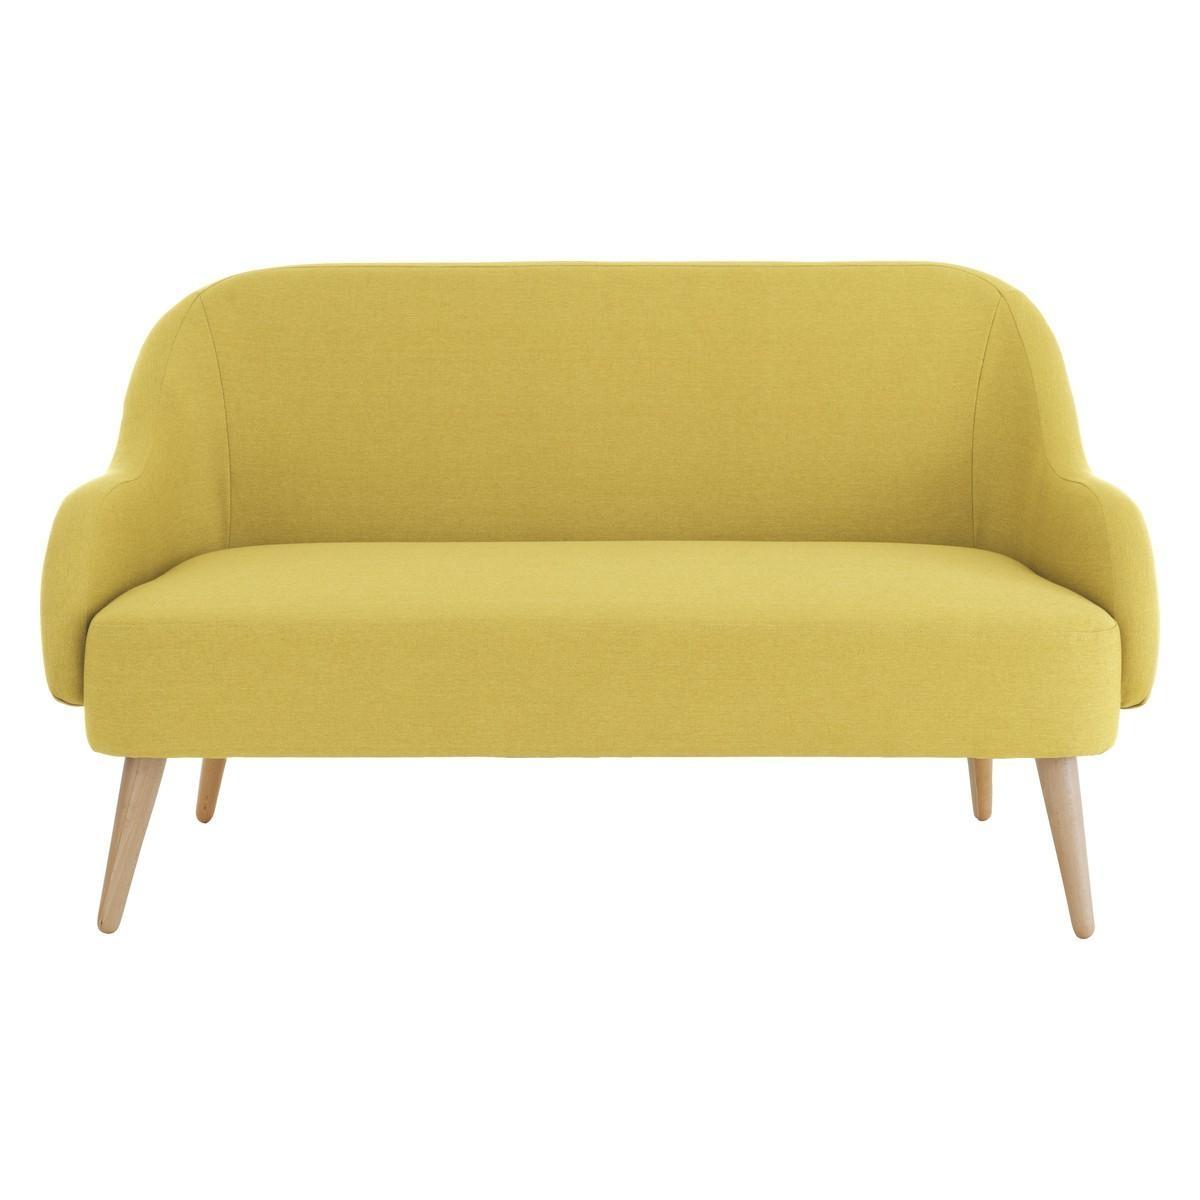 Momo Saffron Yellow Fabric 2 Seater Sofa | Buy Now At Habitat Uk Regarding Yellow Sofa Chairs (Image 13 of 20)